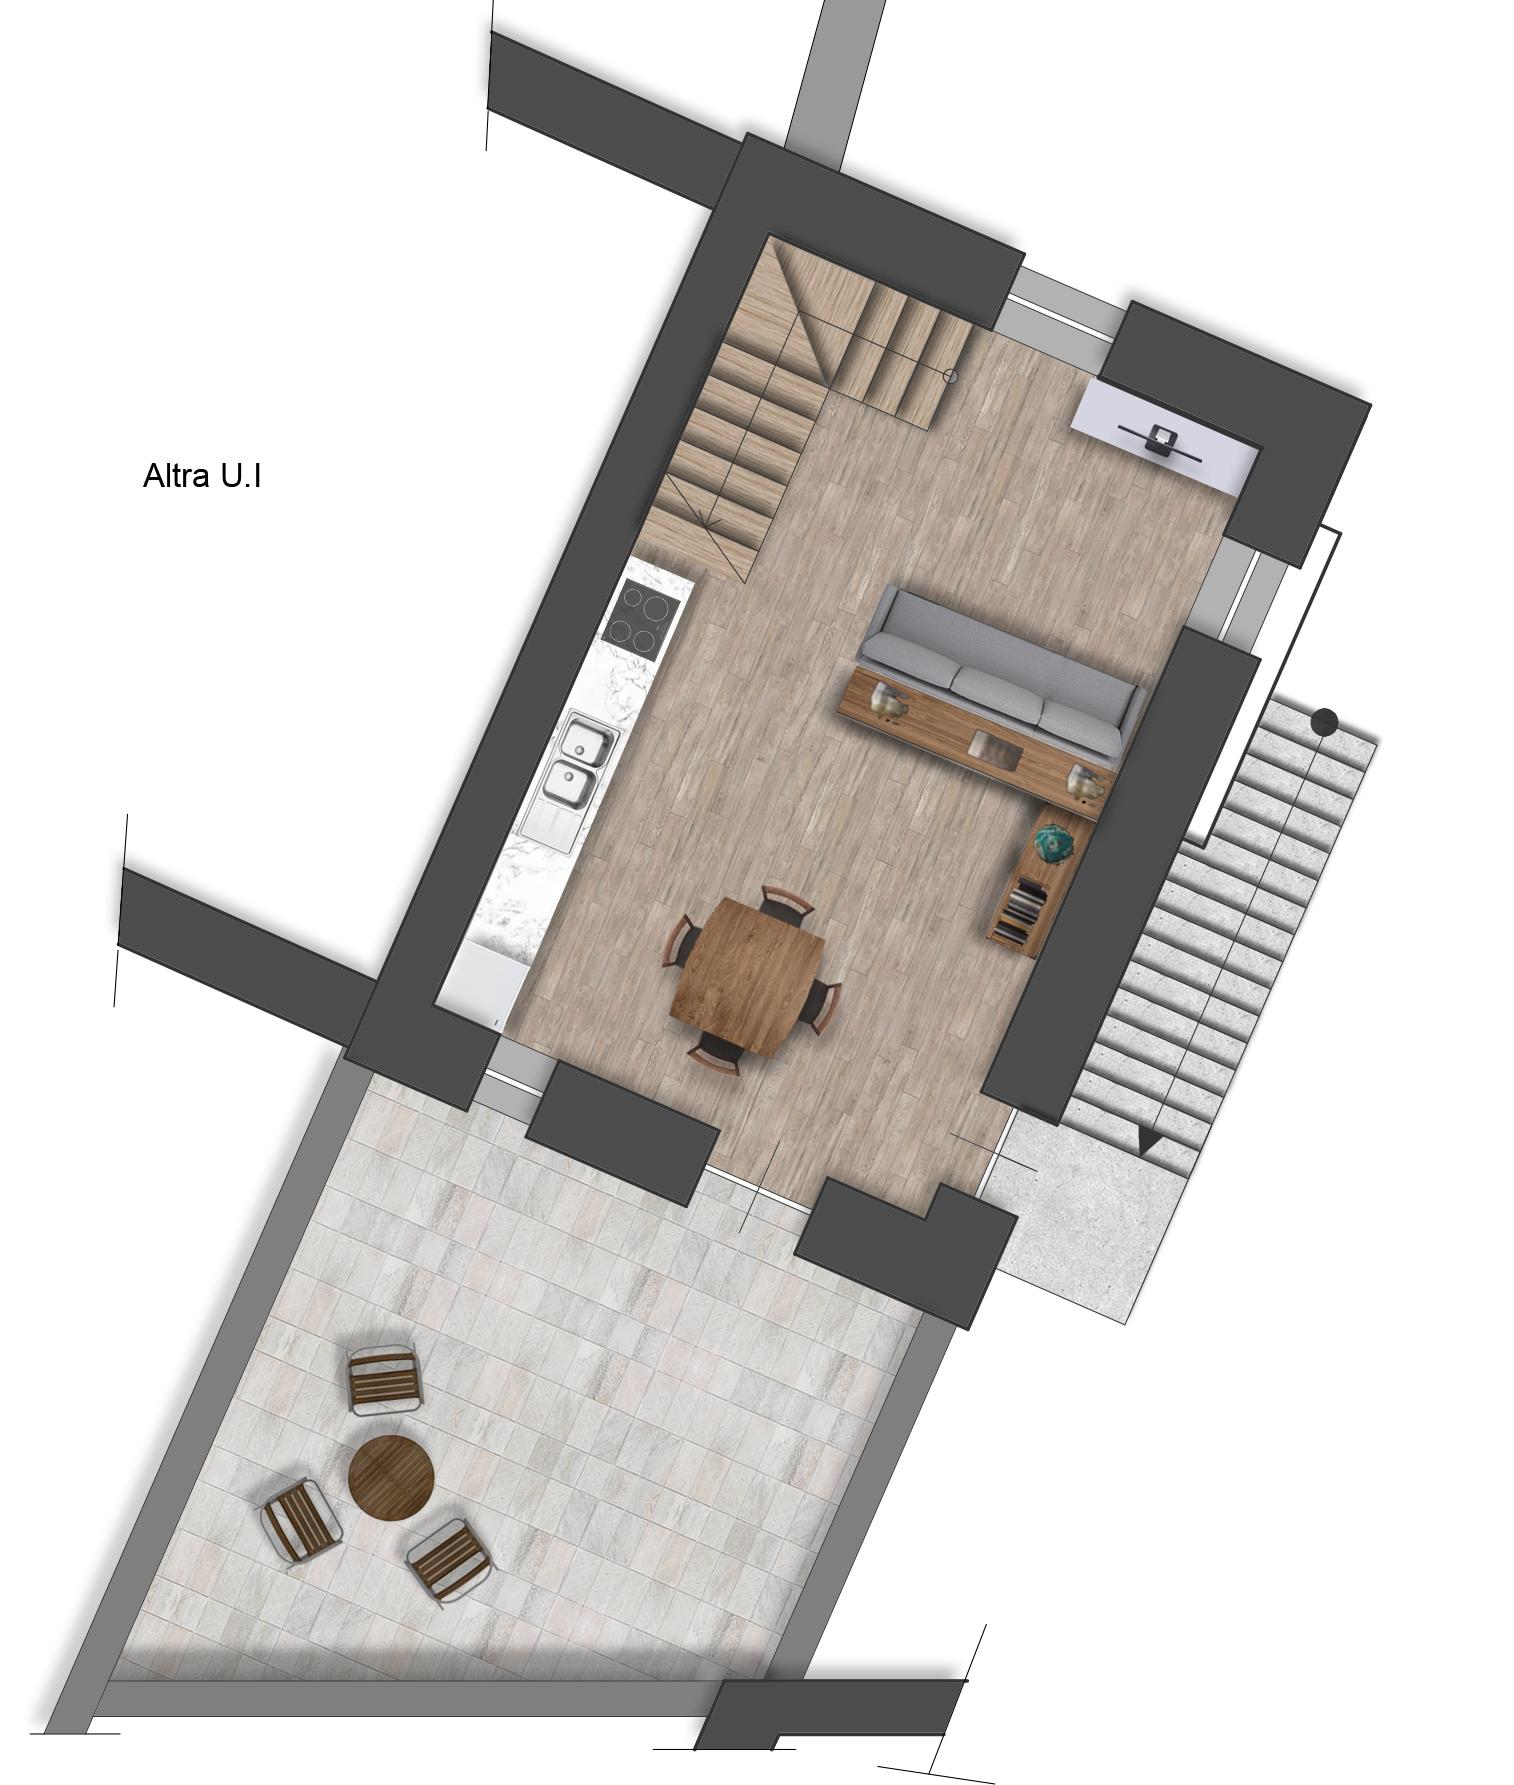 Luserna S.G. – Via Fuhrmann – Residenza Lavanda – Villetta 5